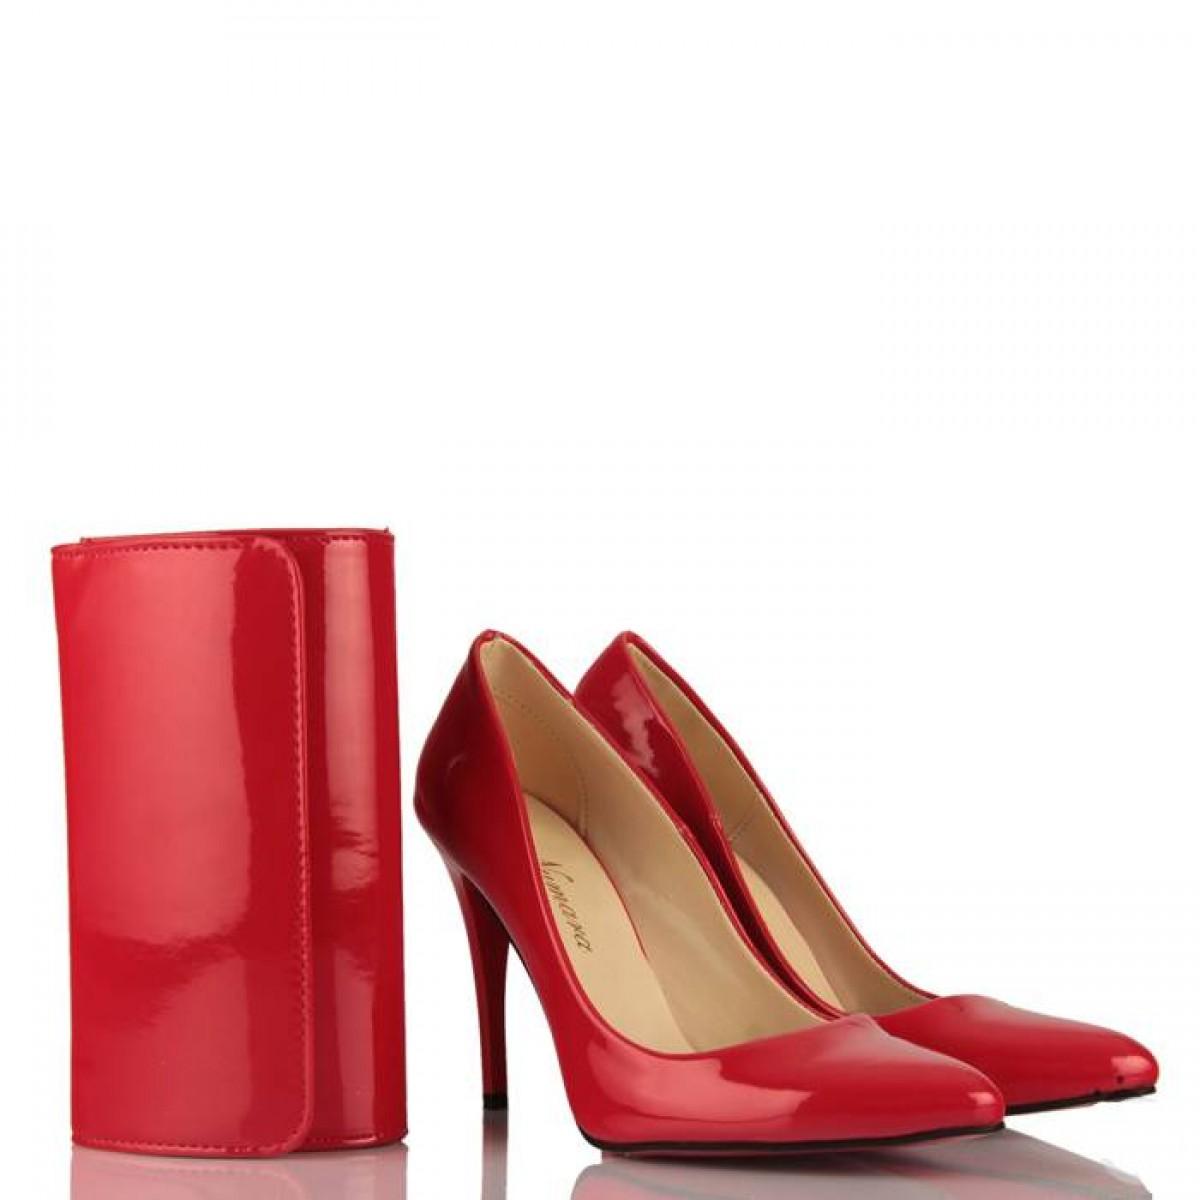 Kırmızı Rugan Stiletto Portföy Takımı